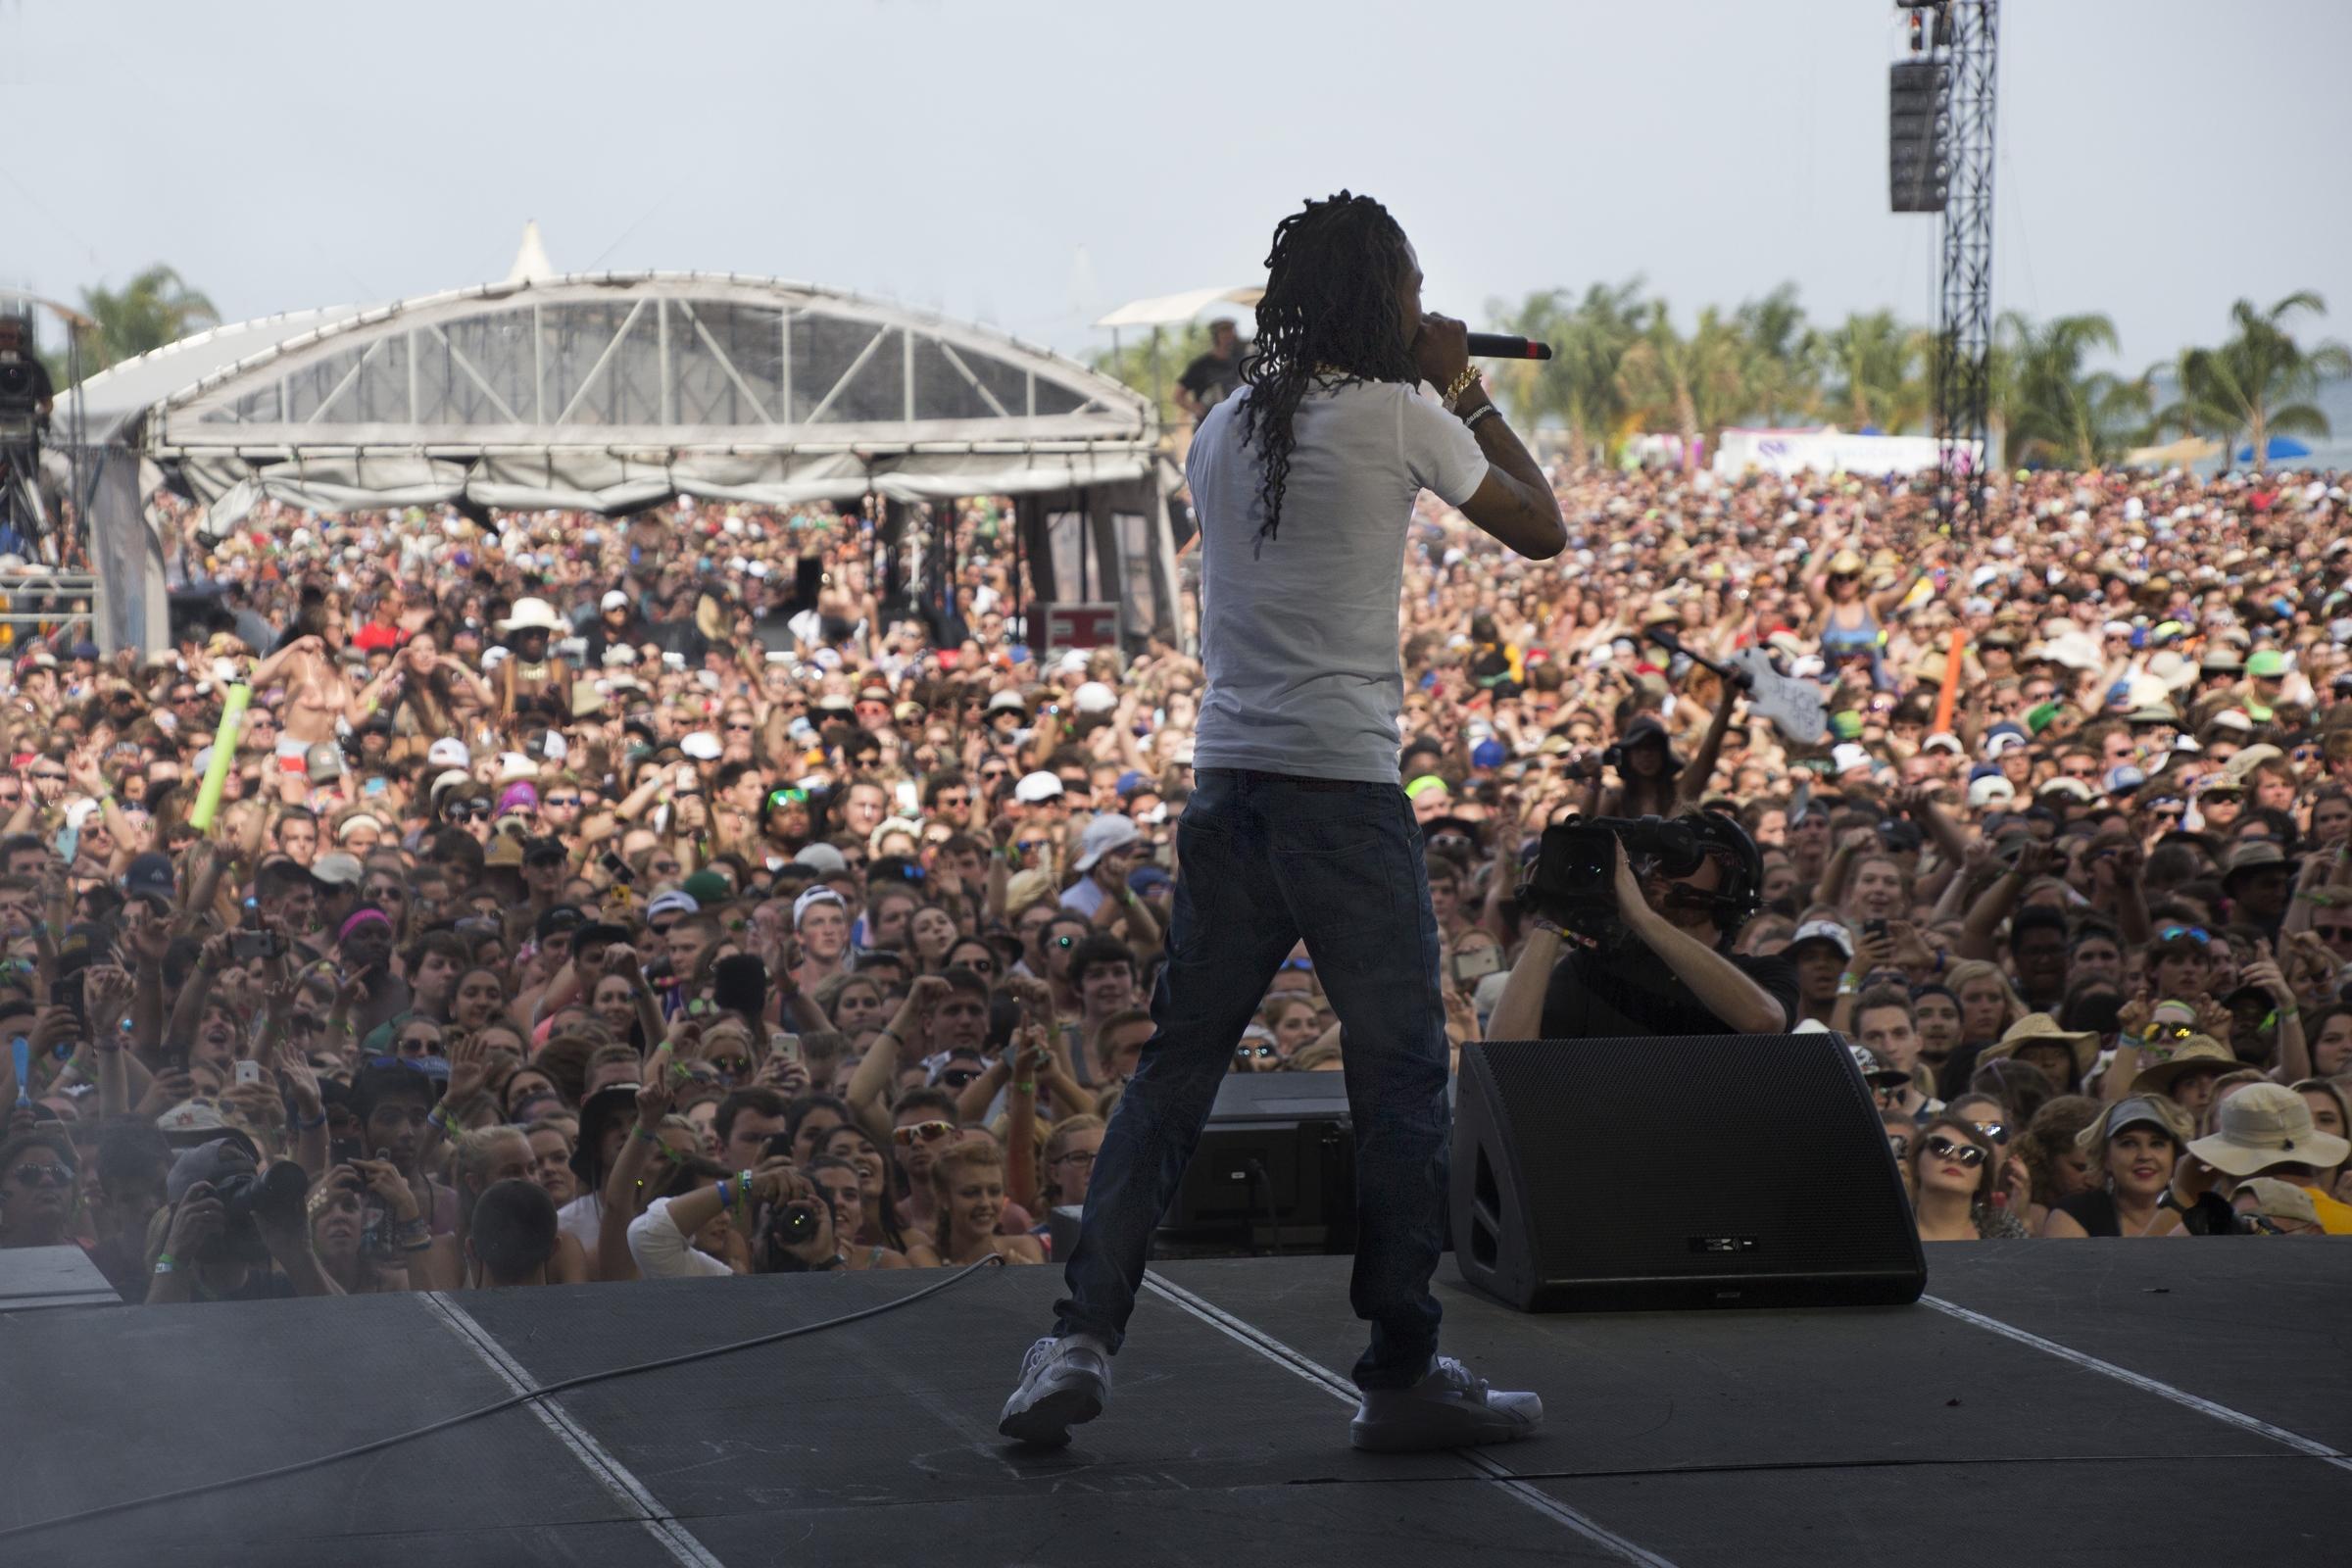 Fetty Wap at Hangout Music Festival 2016. Photo: Courtesy of Hangout Music Festival